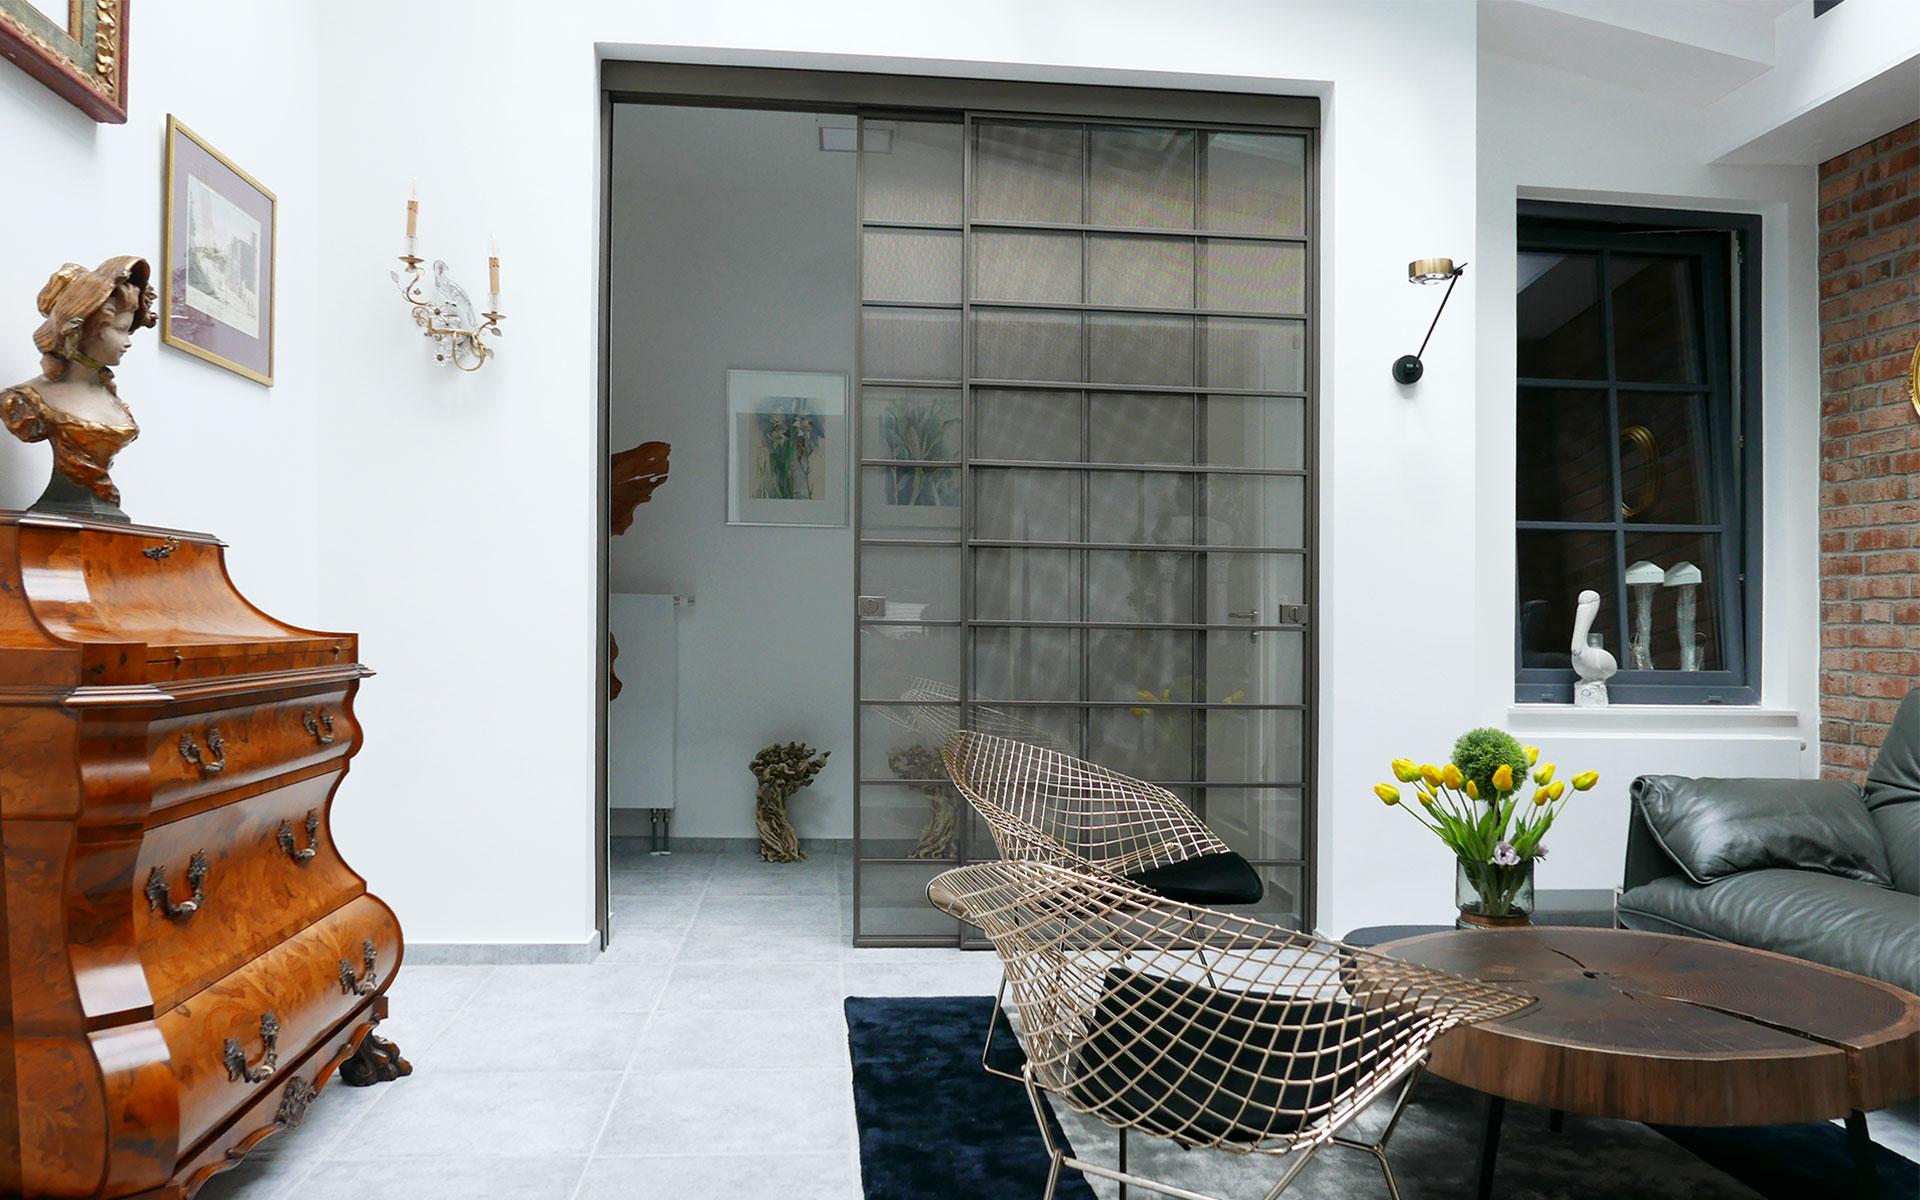 Rimadesio + Poltrona Frau + Knoll Inc. + Janua + Occhio - Interiordesign steidten+ Berlin